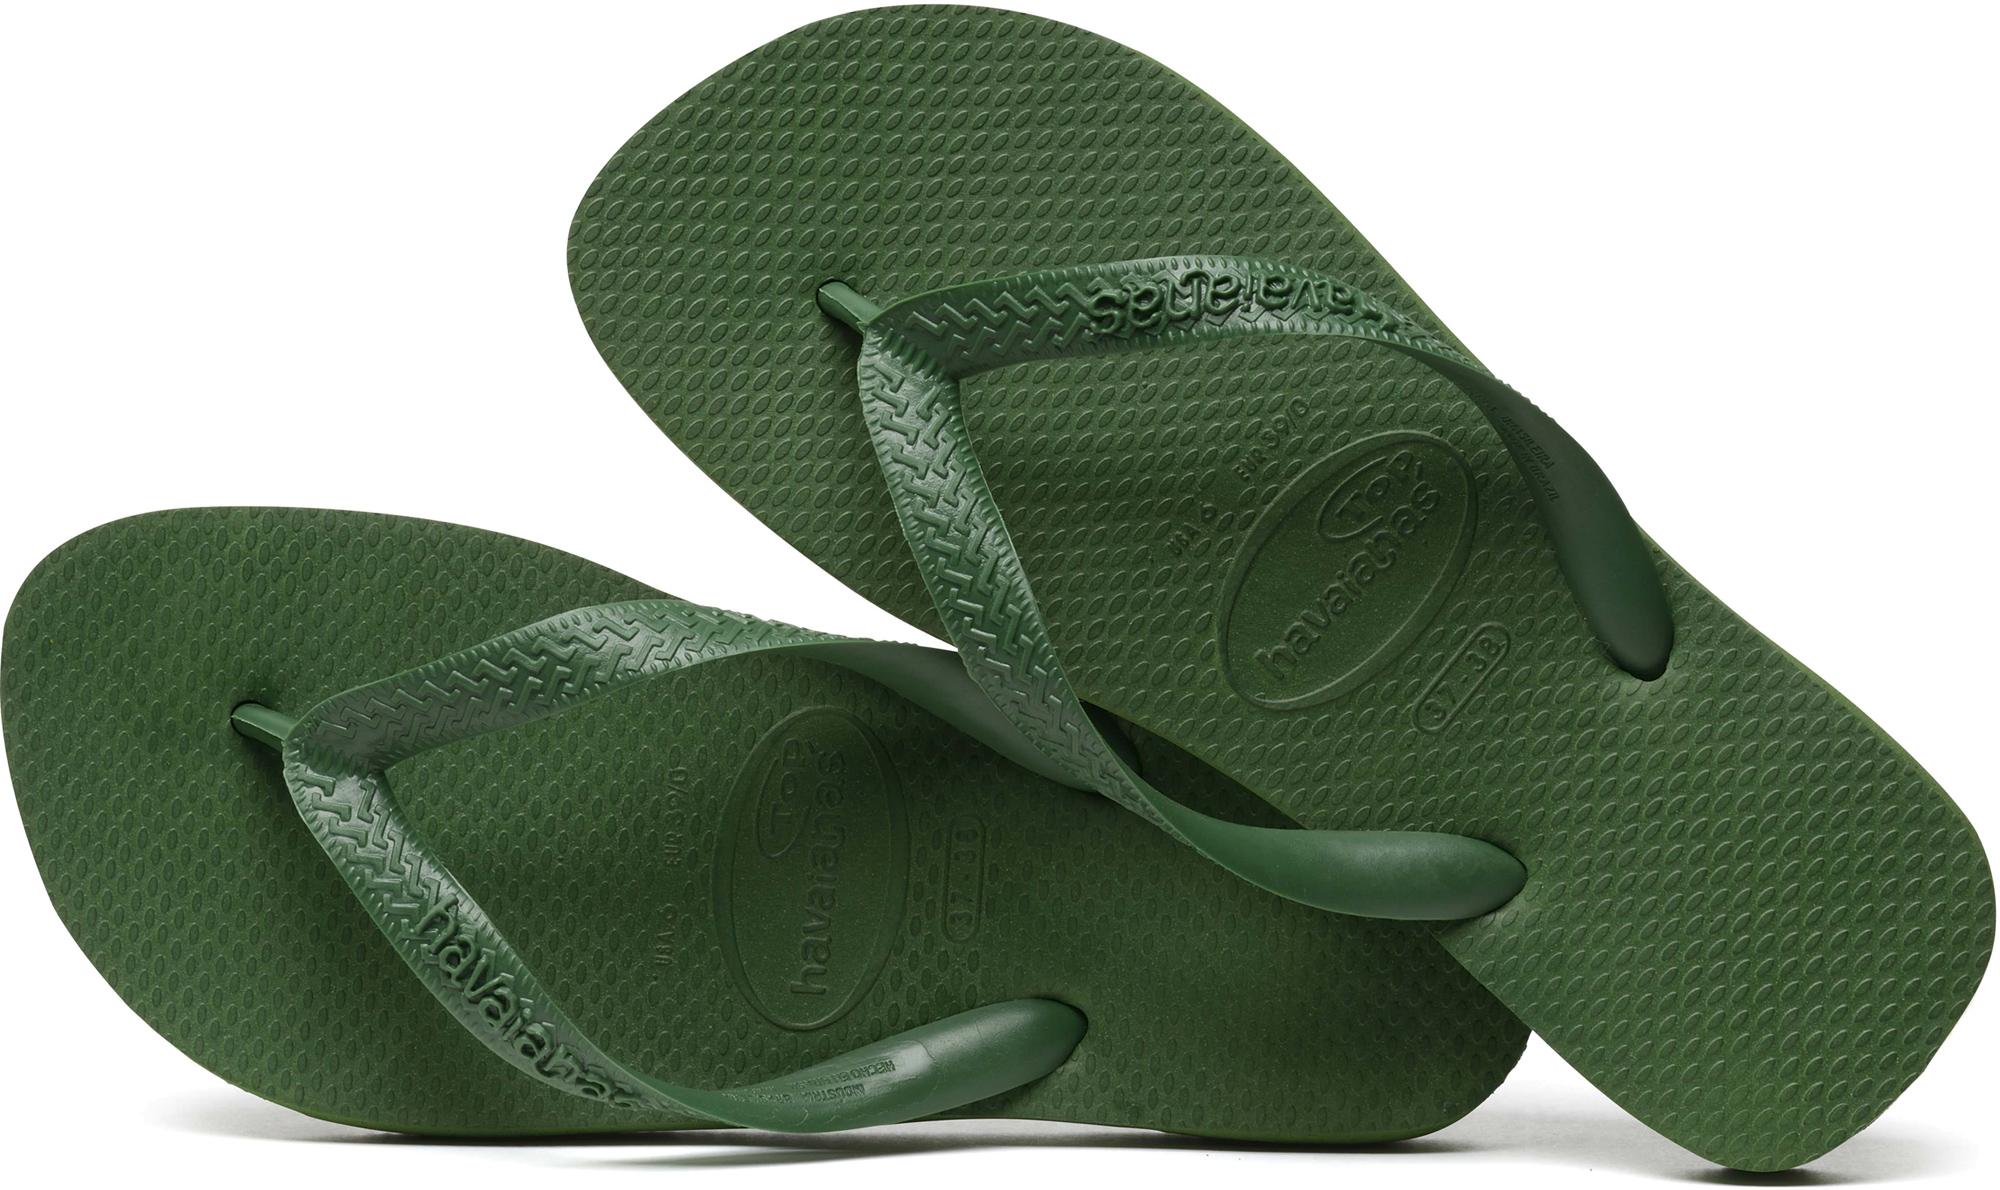 e45c27b8fbb1 Havaianas Top flip flops. The original unisex Brazil sandals. New ...